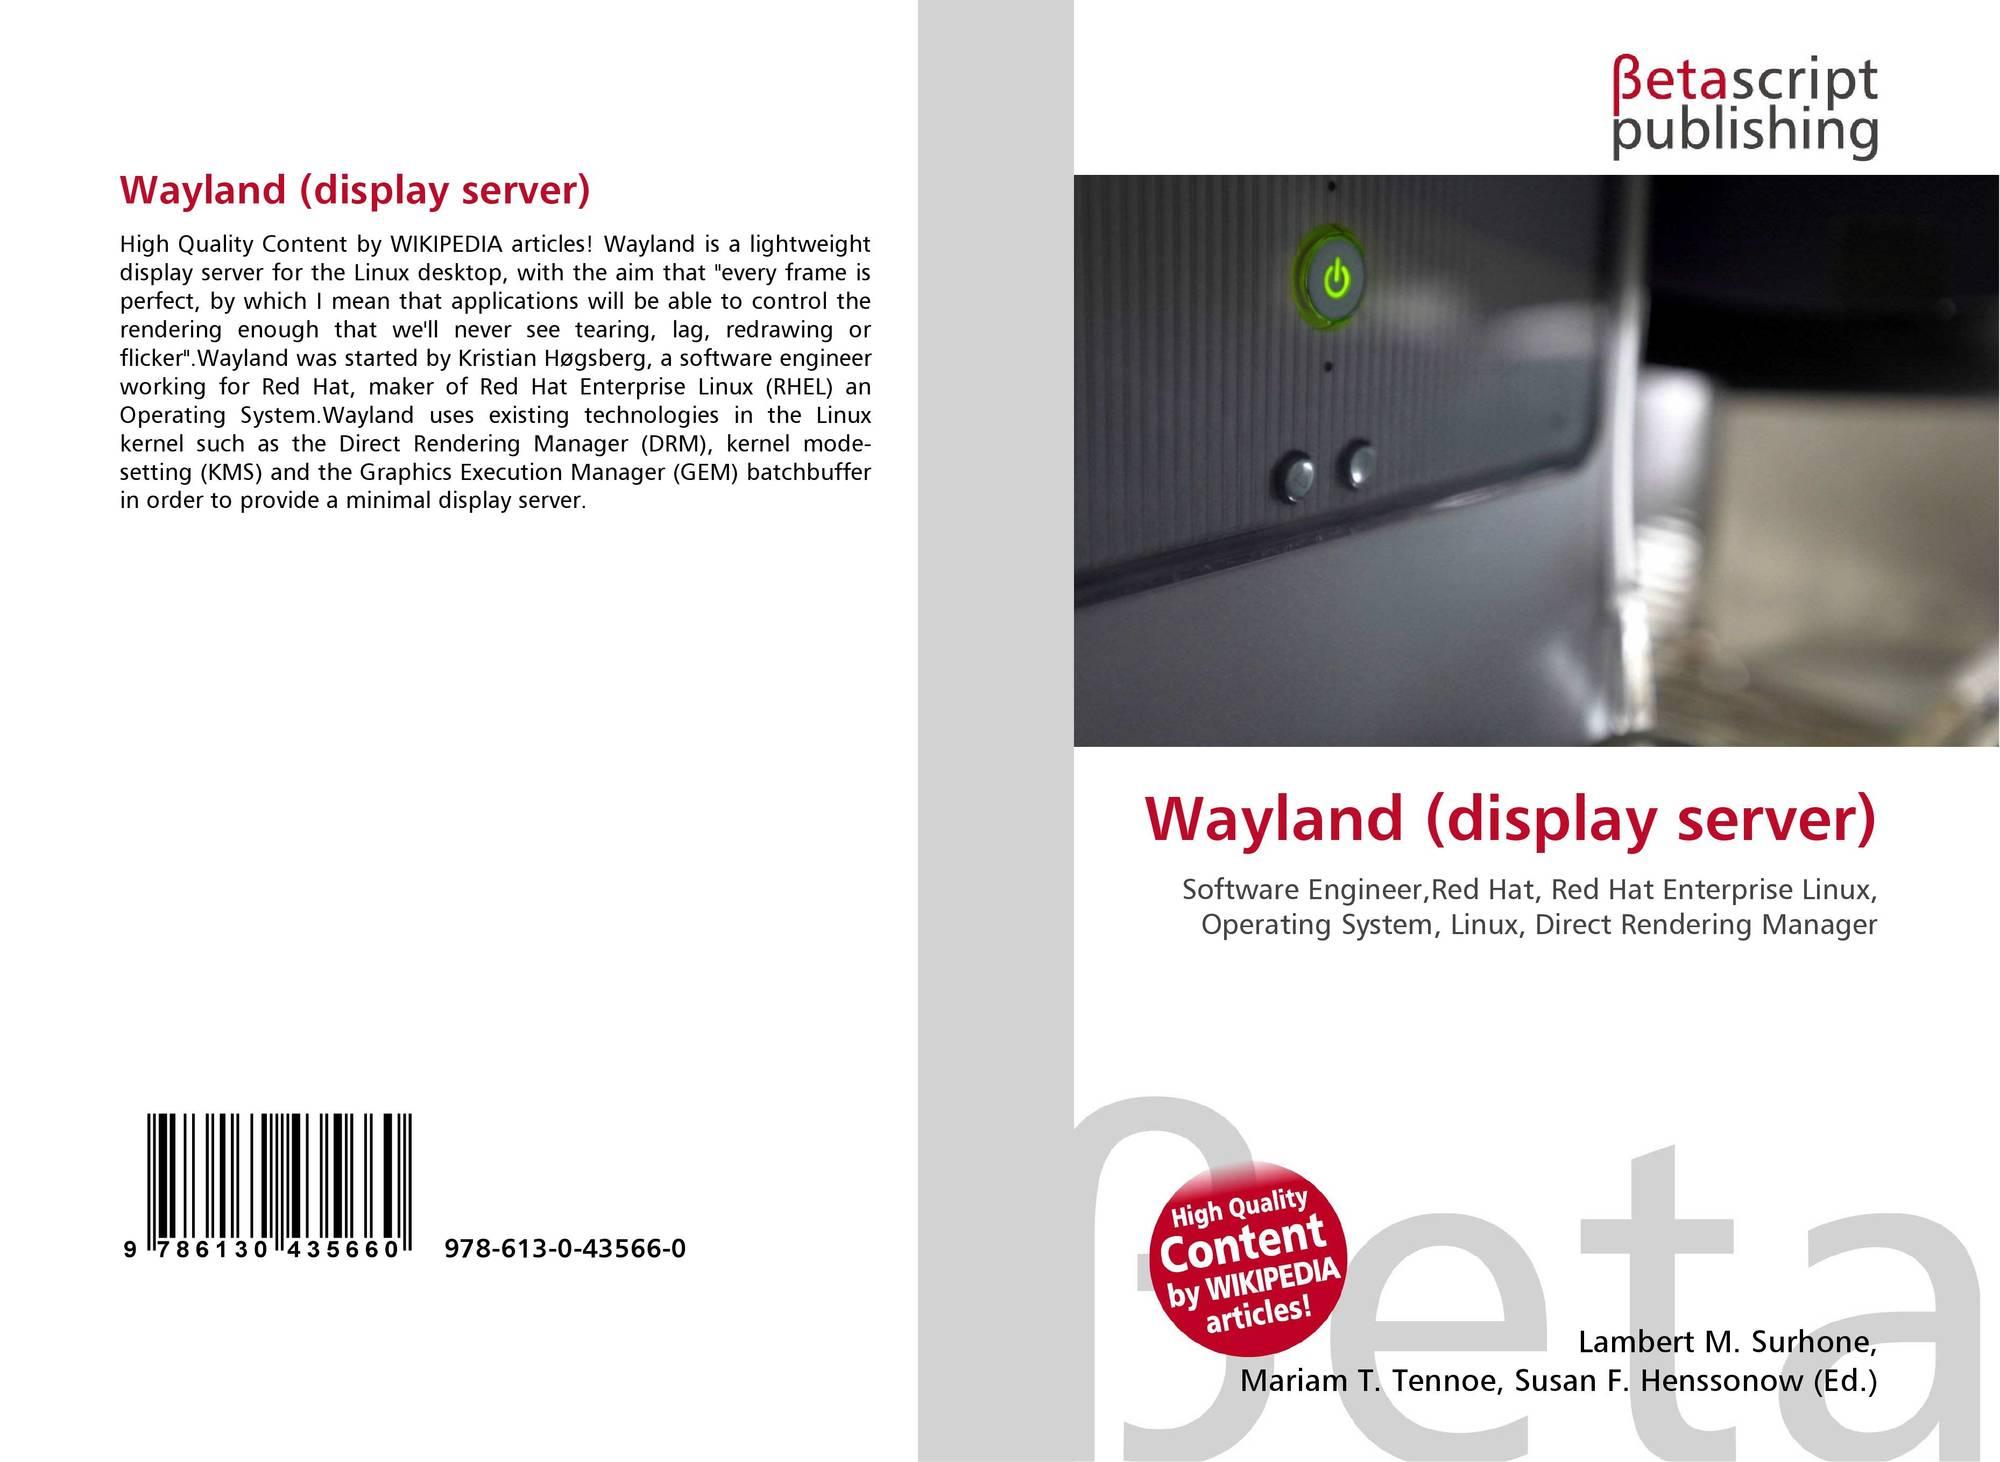 Wayland (display server), 978-613-0-43566-0, 6130435665